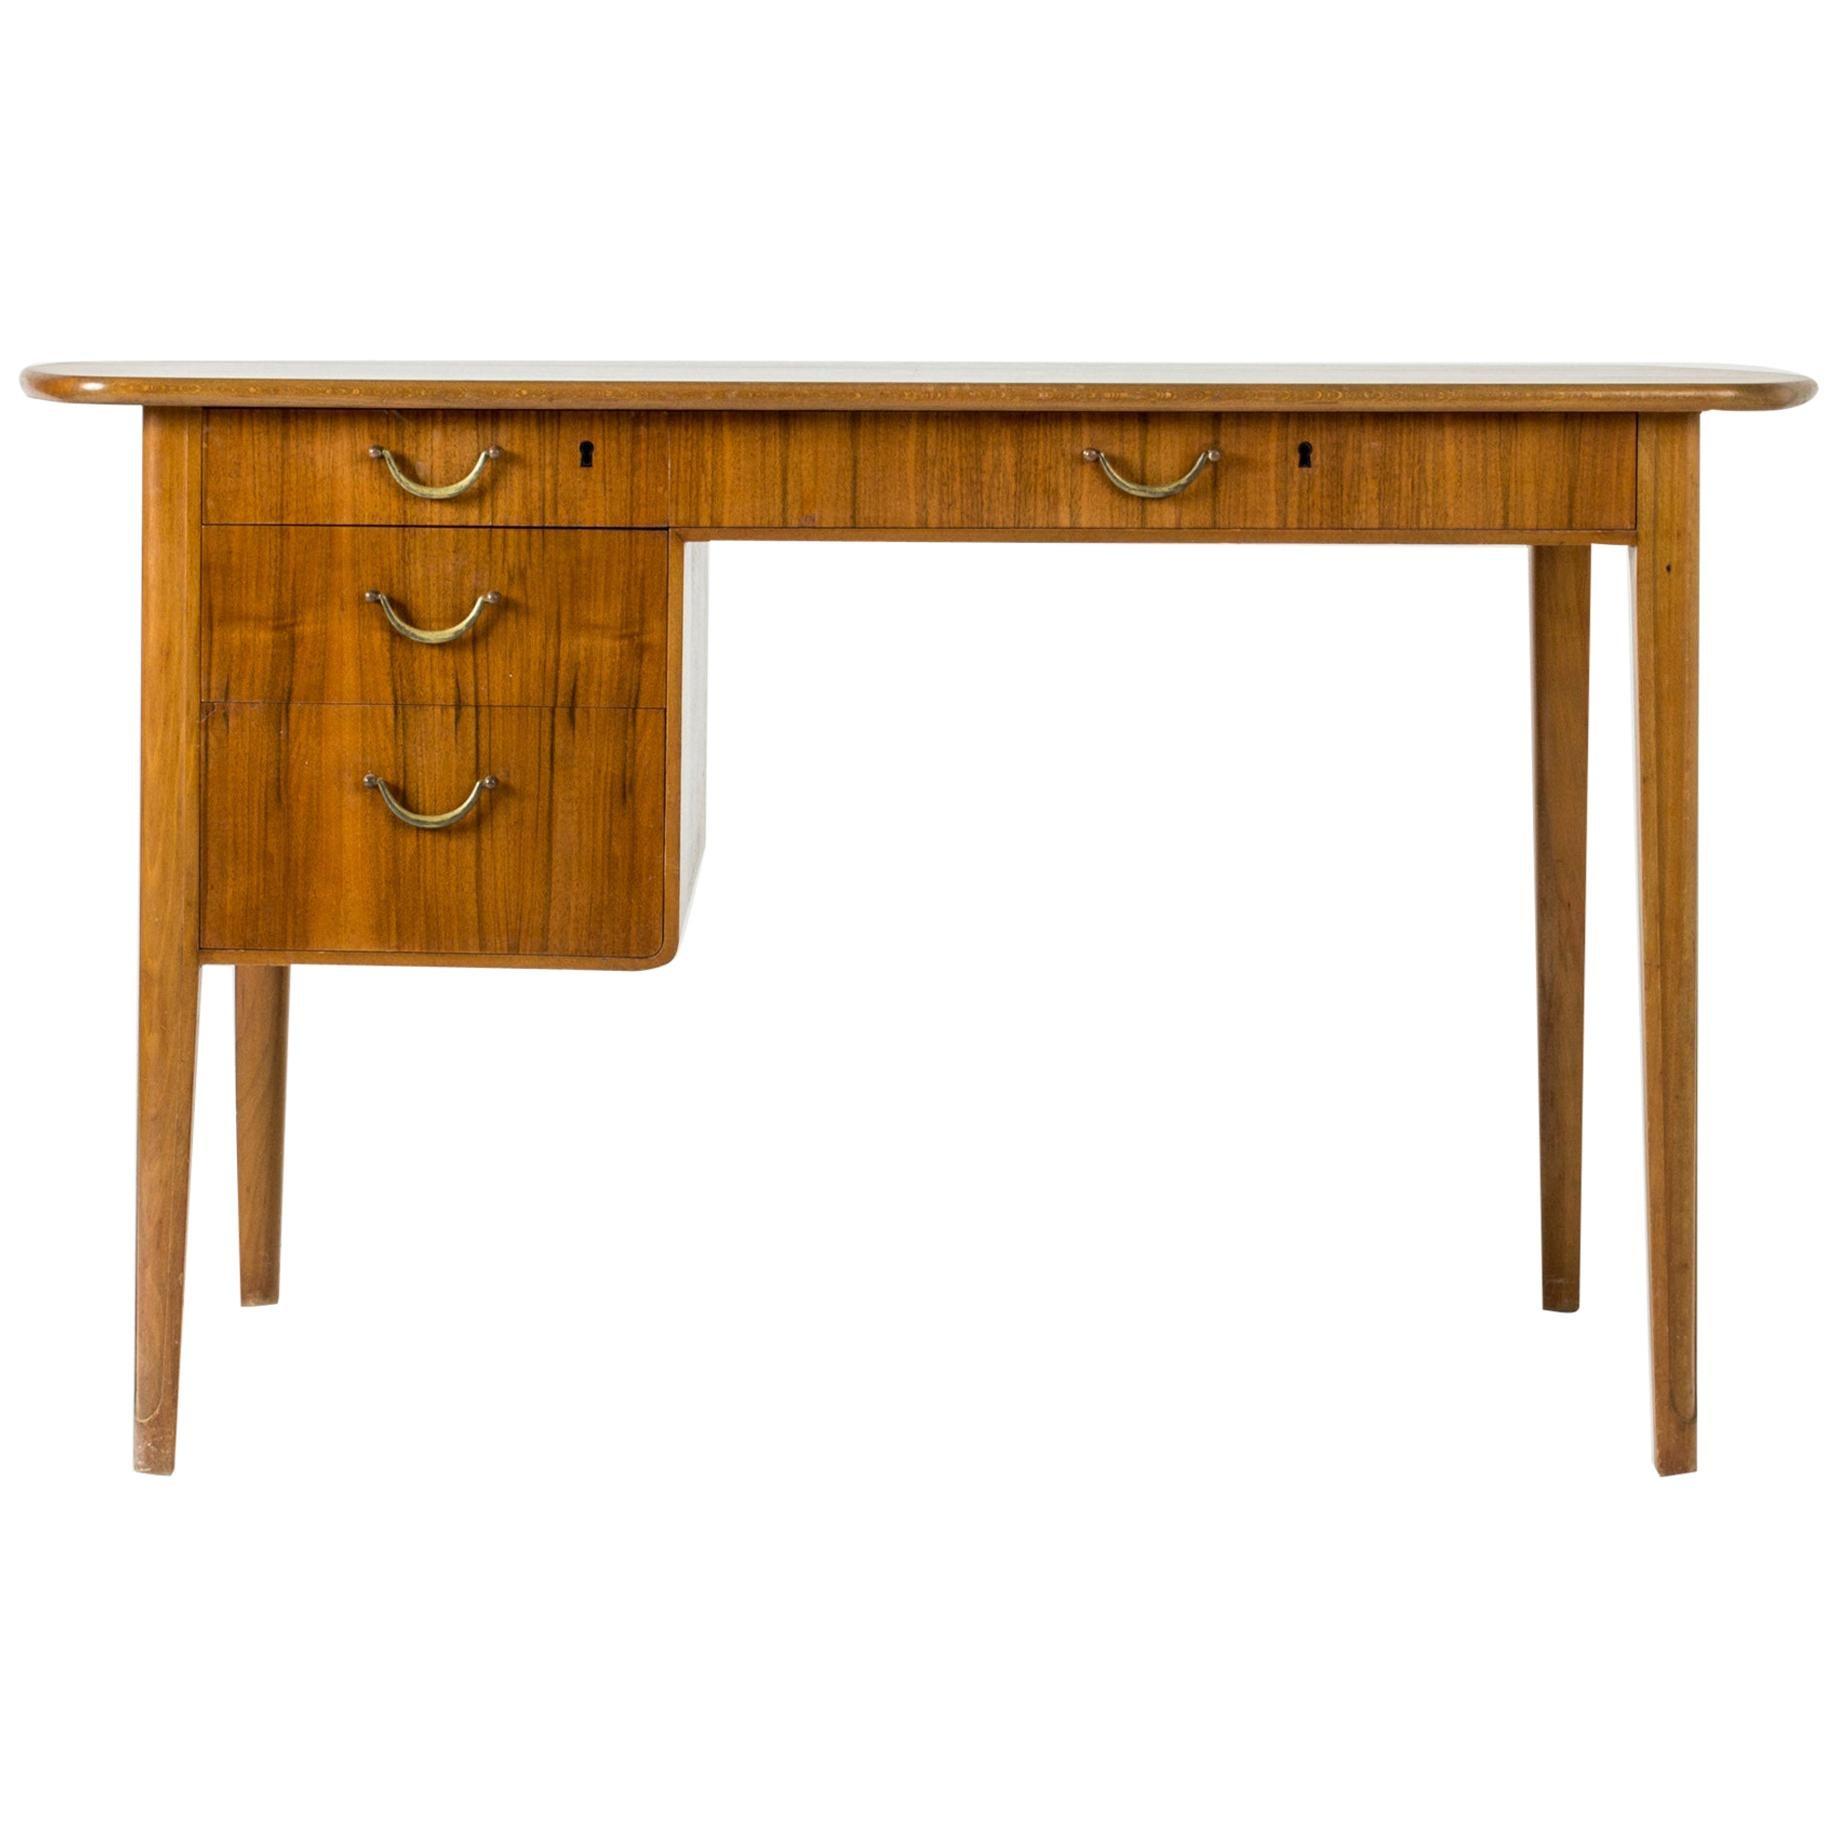 Midcentury Mahogany Desk, Sweden, 1950s